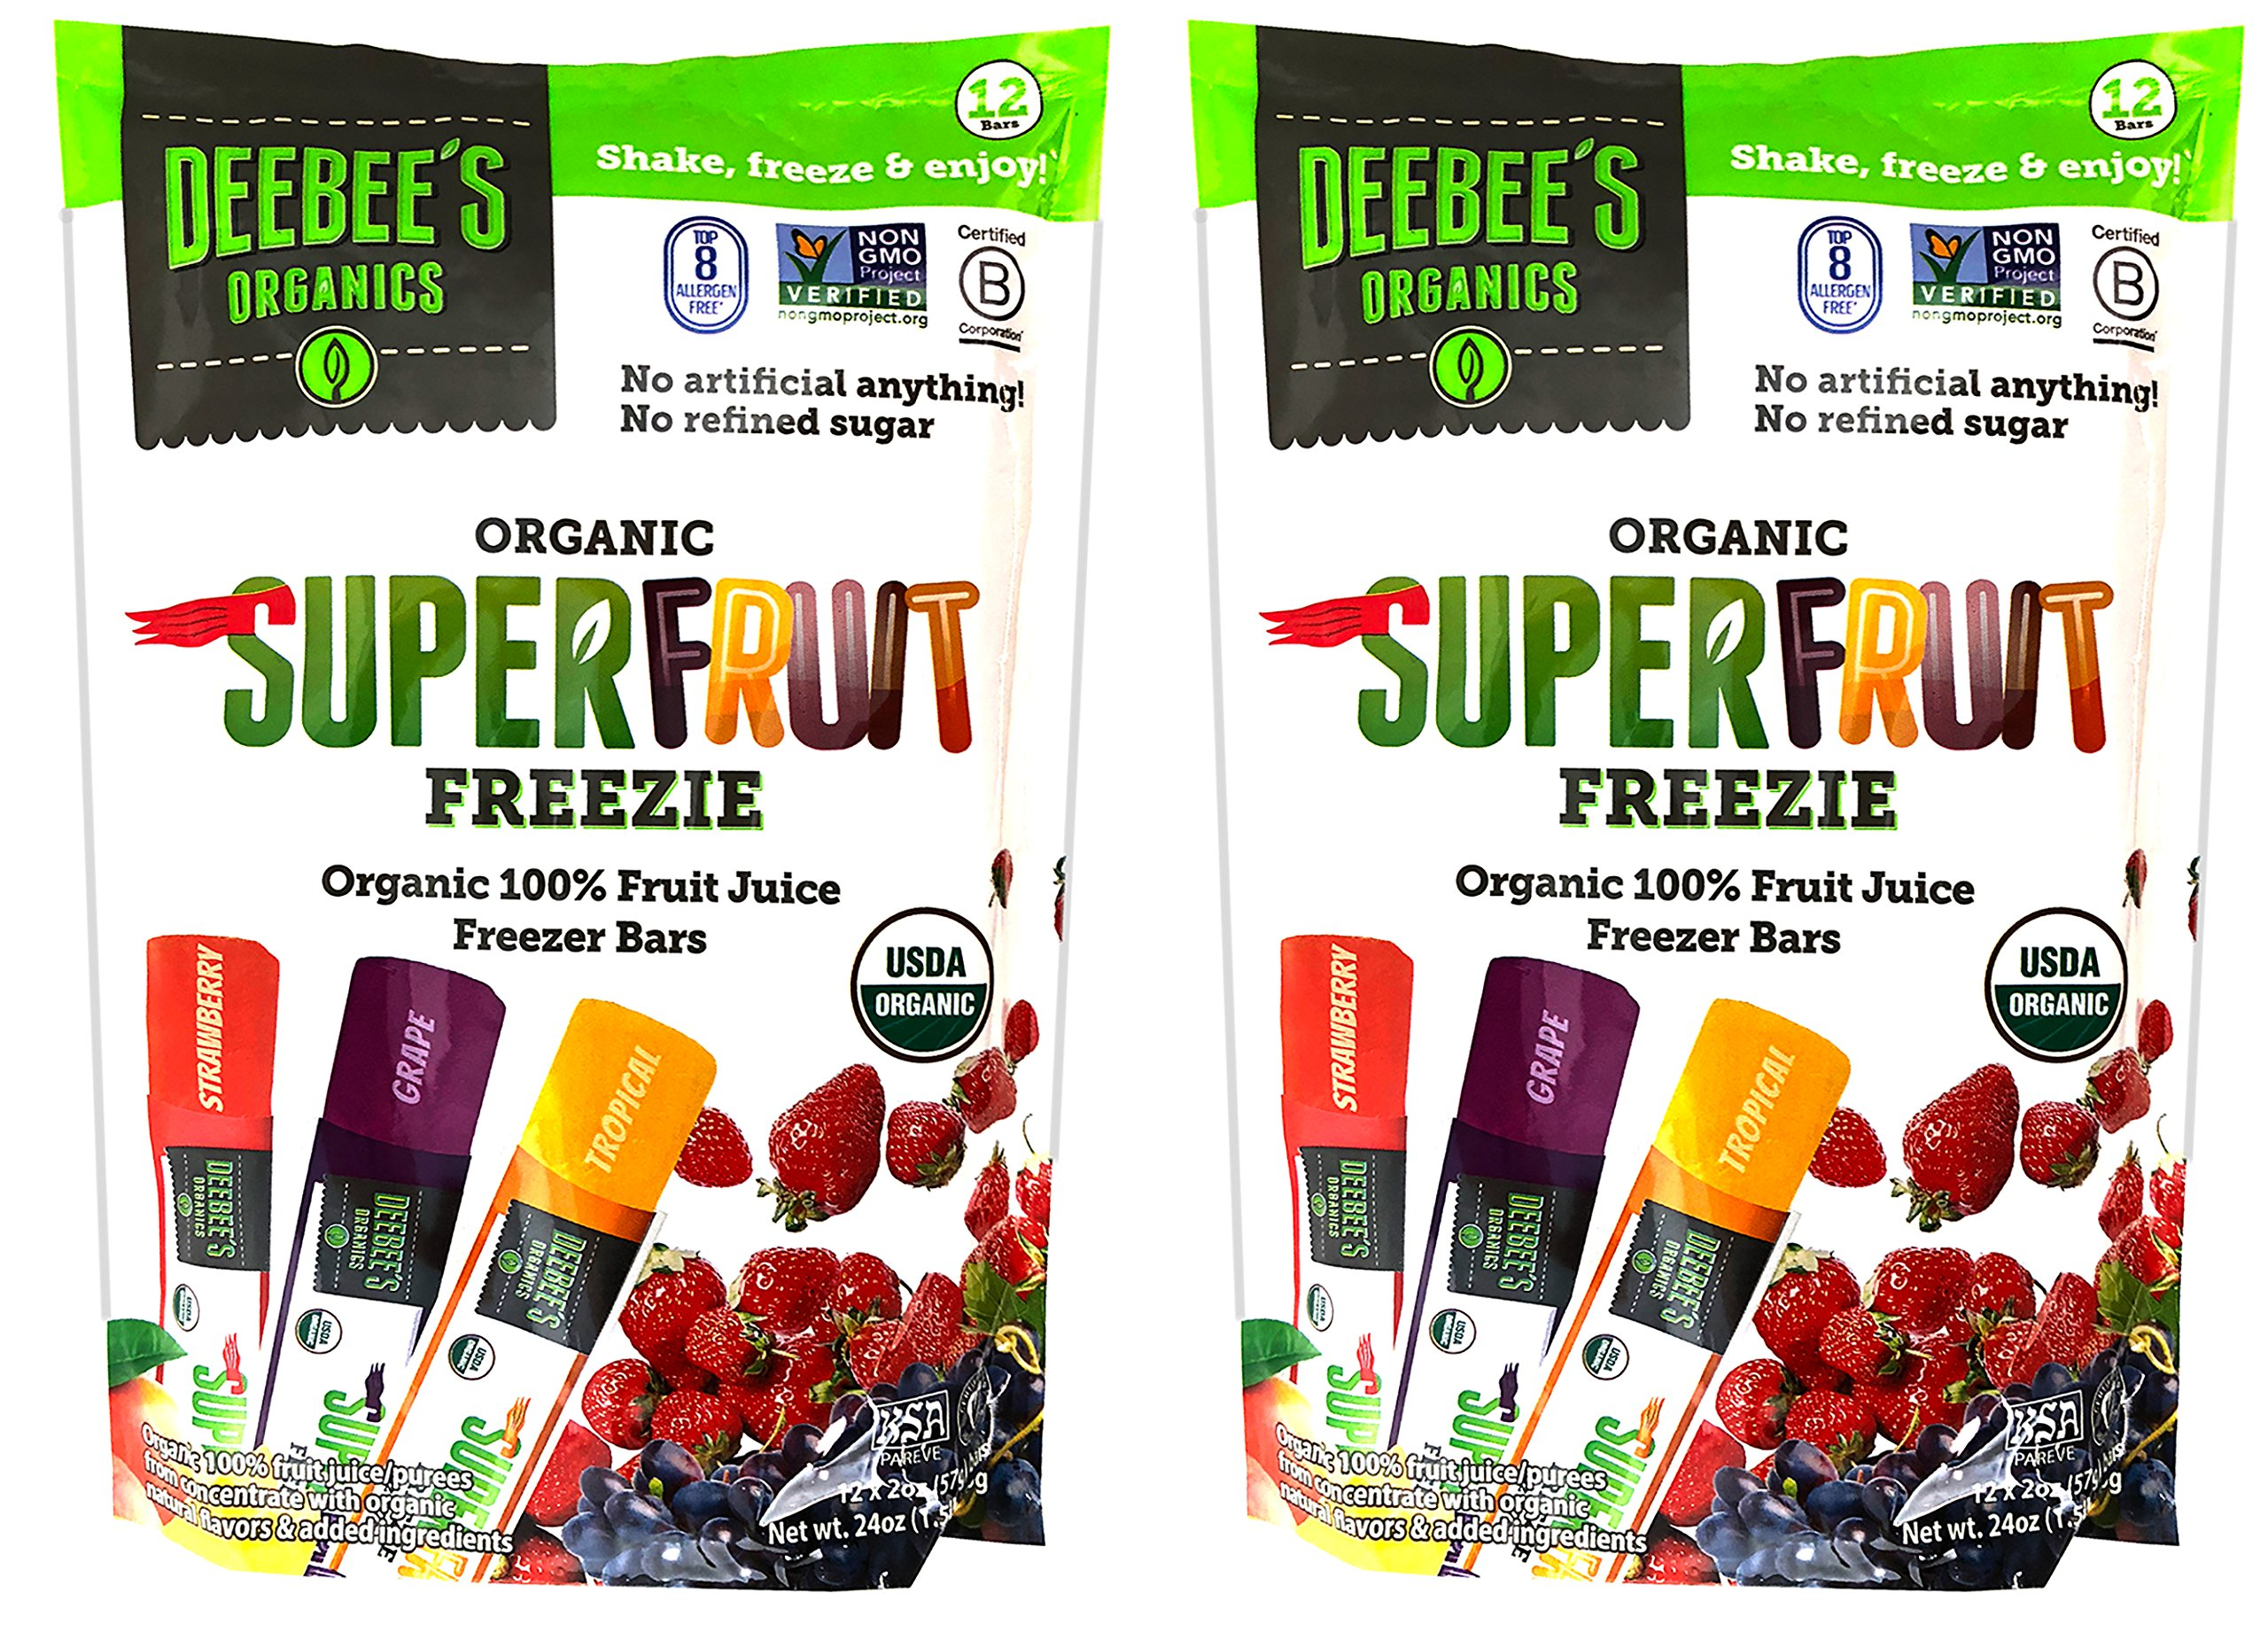 Deebee's Organic Superfruit Freezie Pops - Organic 100% Fruit Juice Freezer Bars (Pack of 24)